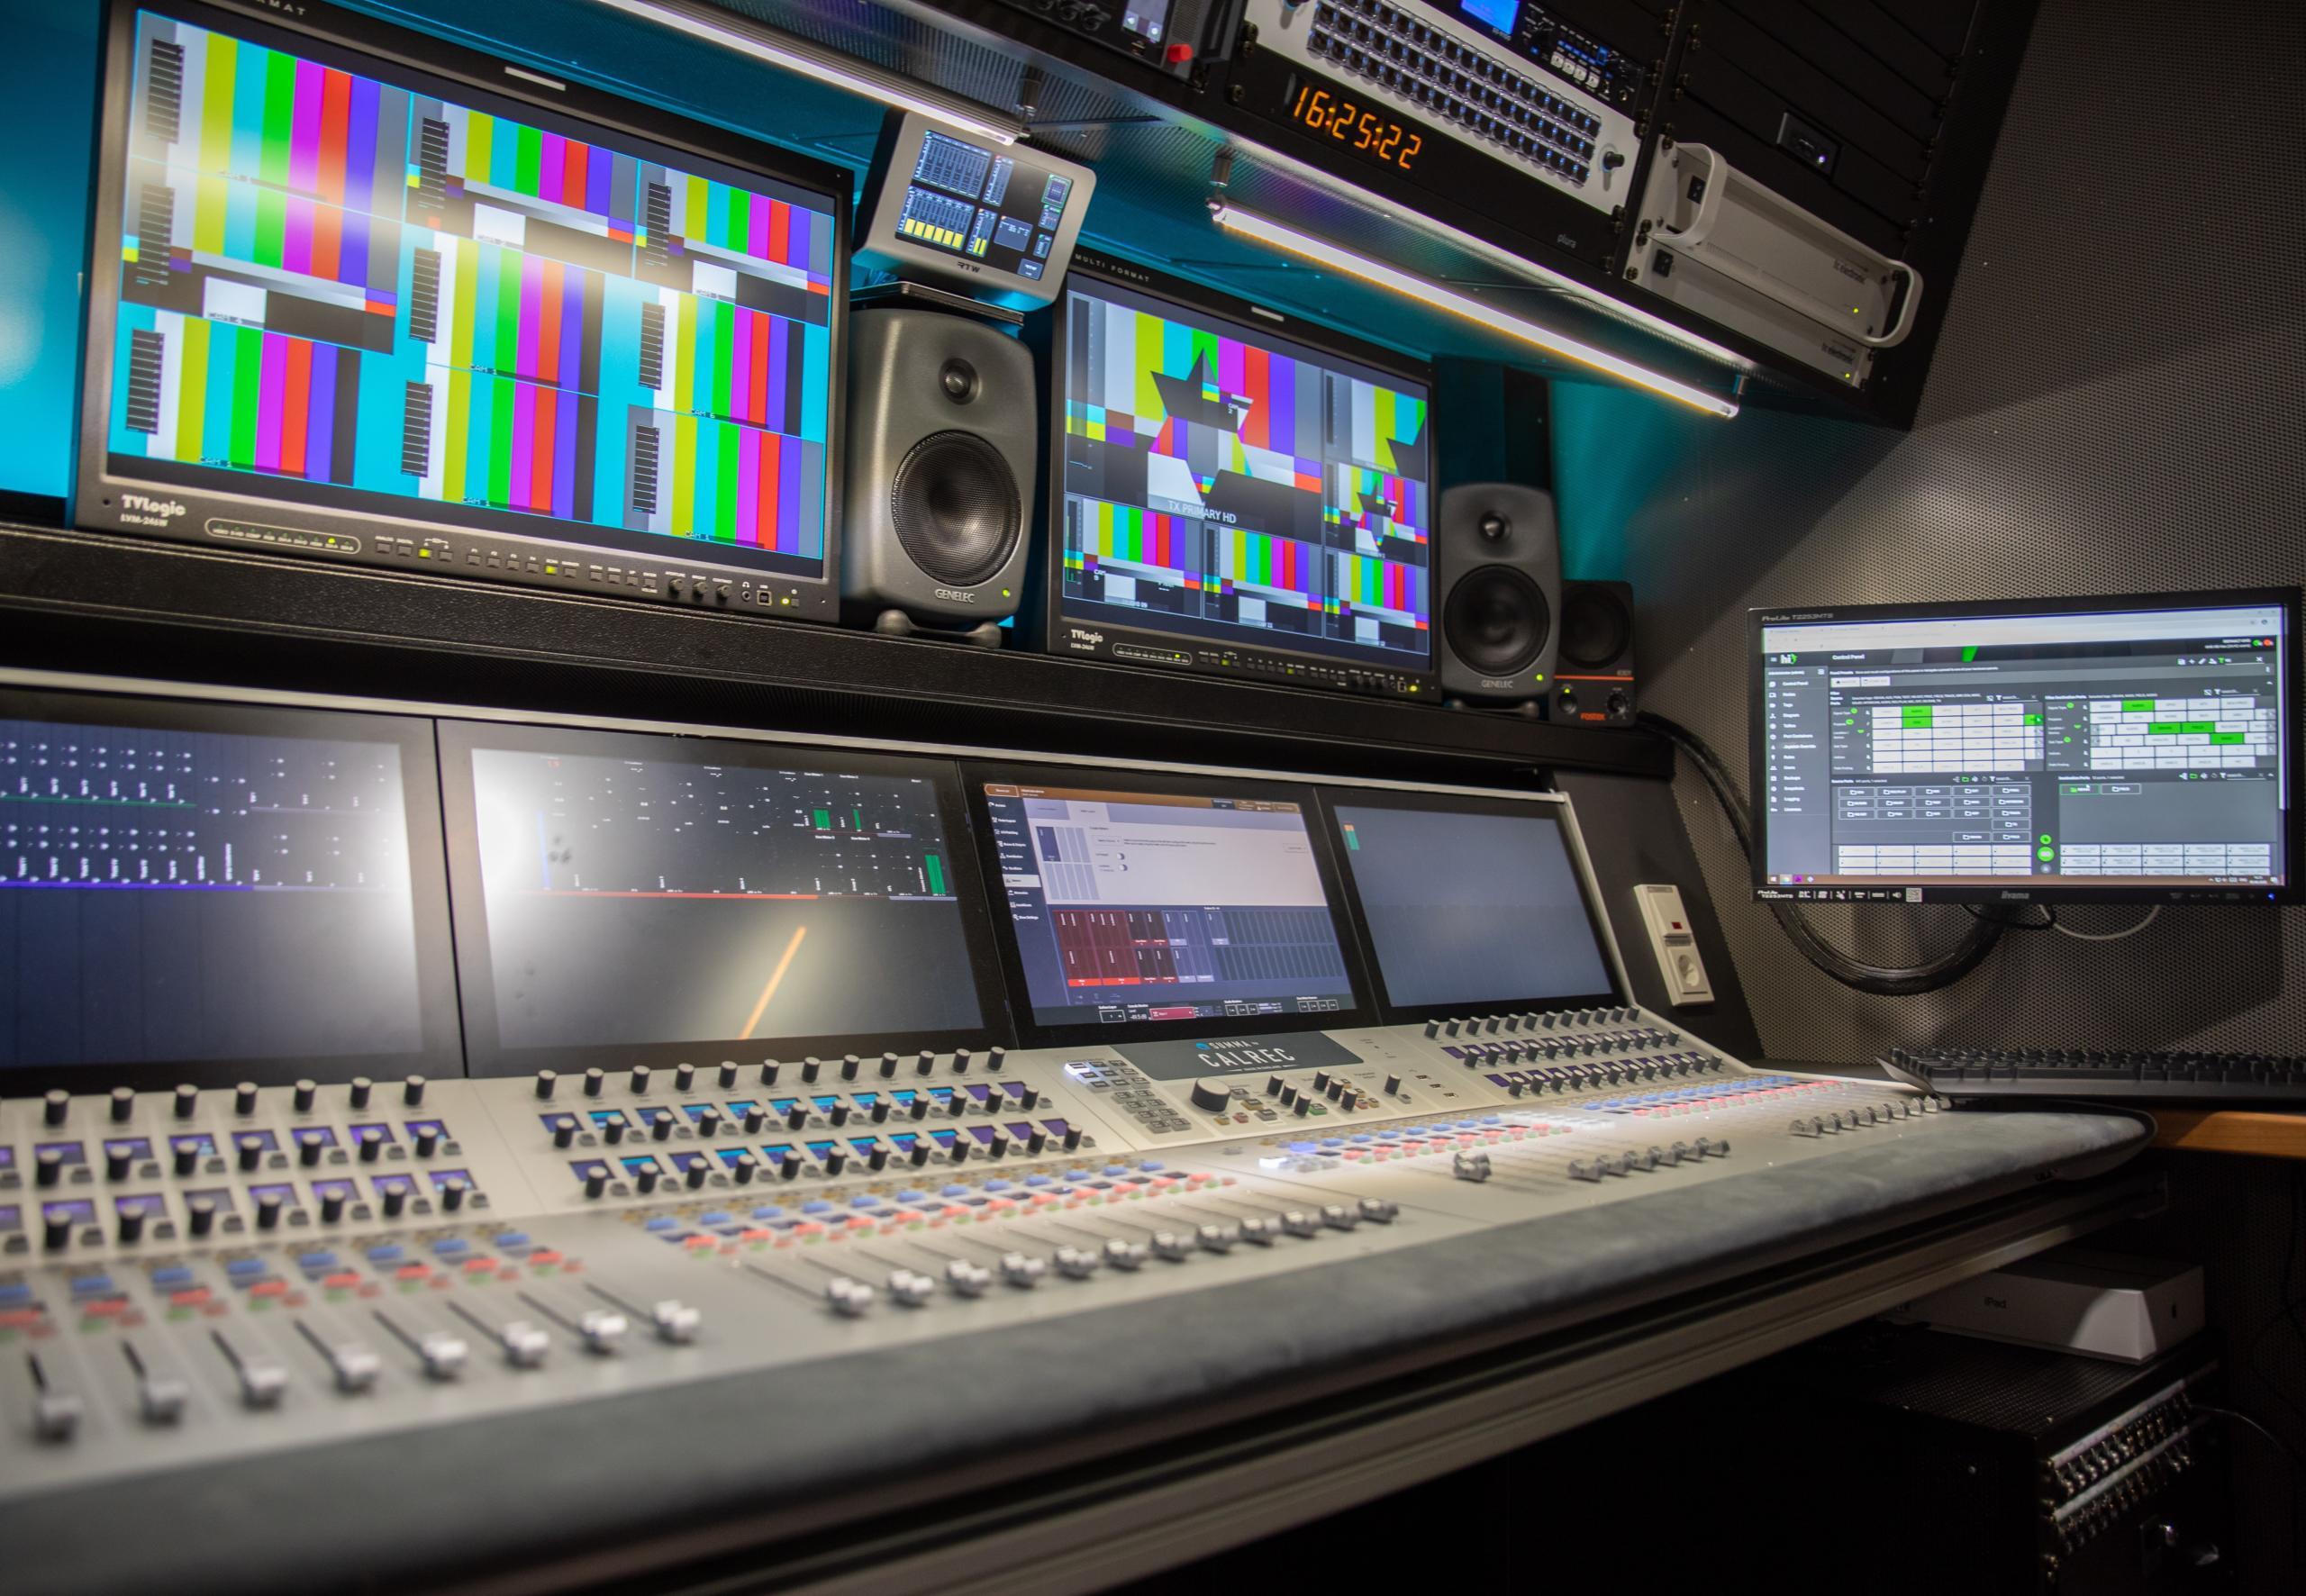 Calrec Summa audio console in City TV Radio Agency's UHD OB van in St. Petersburg, Russia